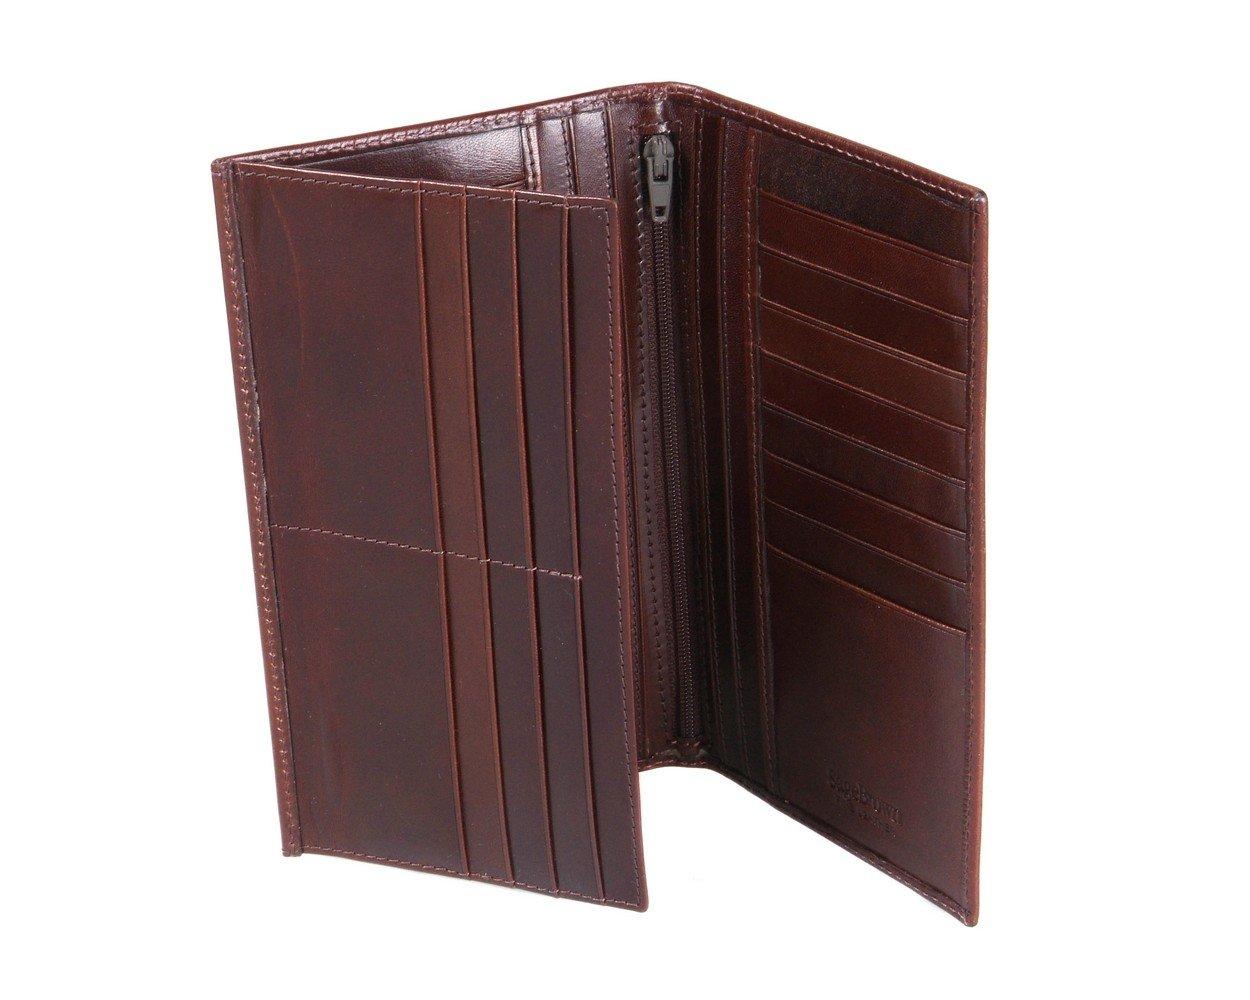 SAGEBROWN Brown Men's Tall Leather Wallet by Sage Brown